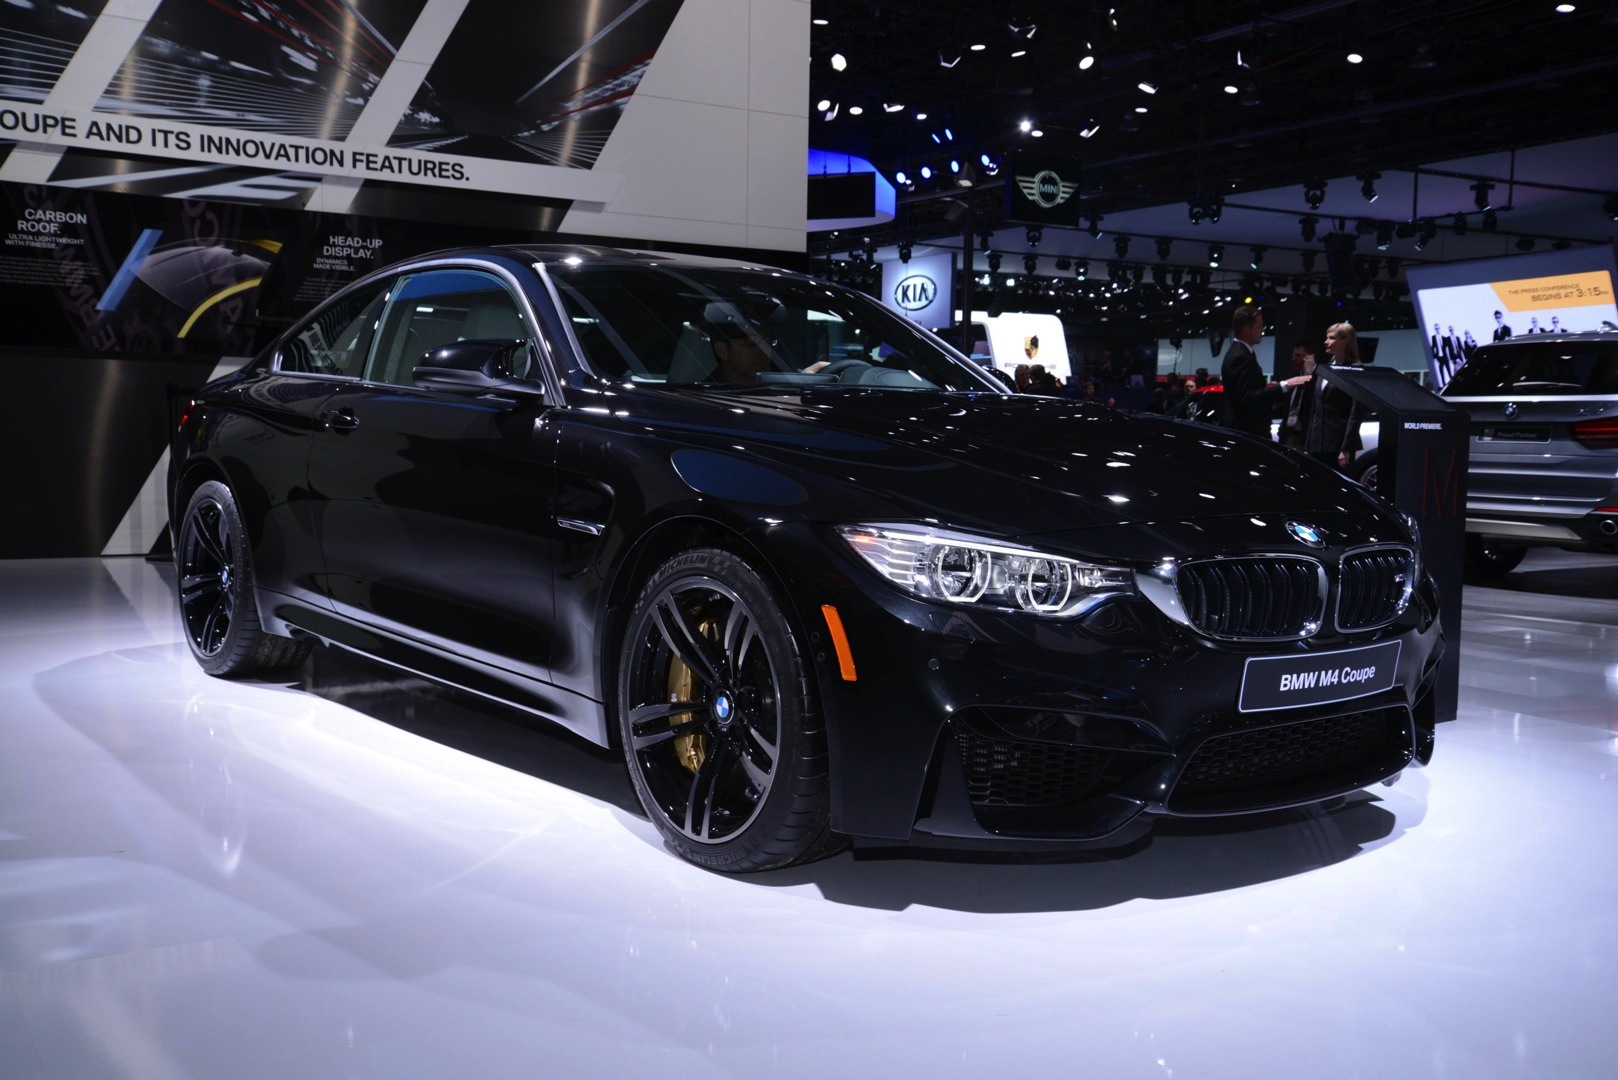 Sapphire Black BMW M4 Looks Brilliant at 2014 NAIAS [Live ...